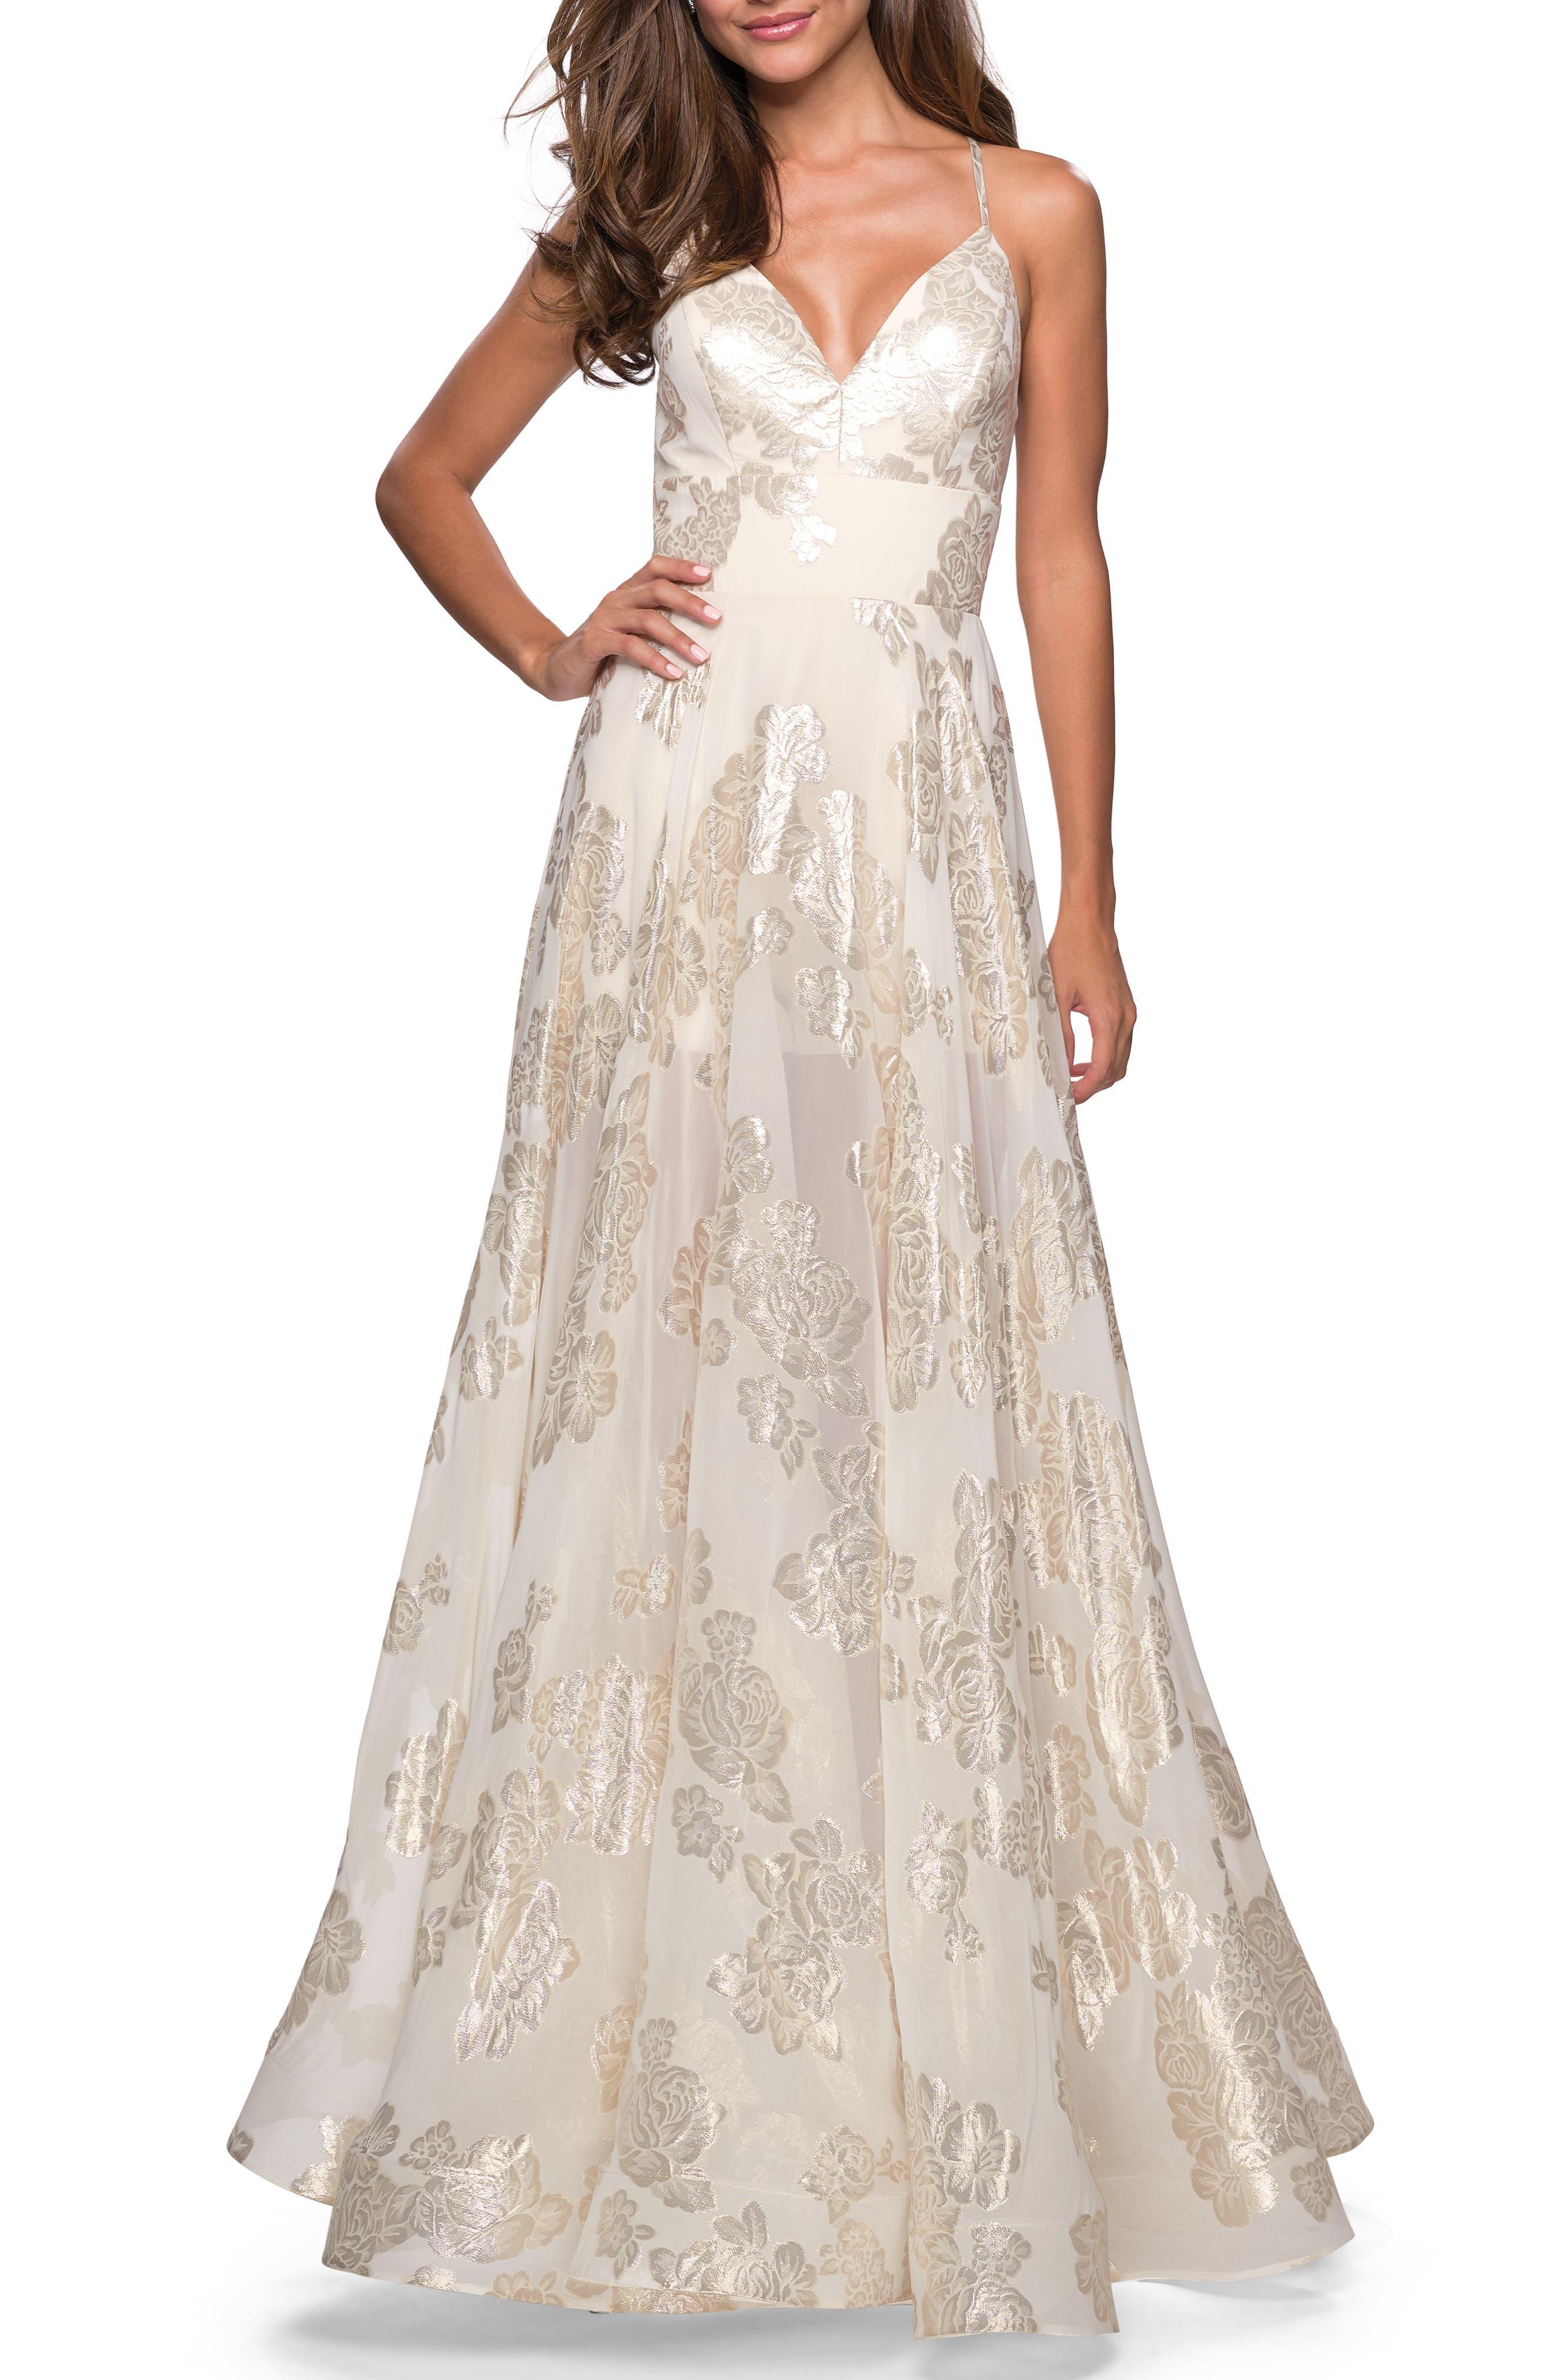 La Femme Floral Chiffon Jacquard Evening Dress, Ivory